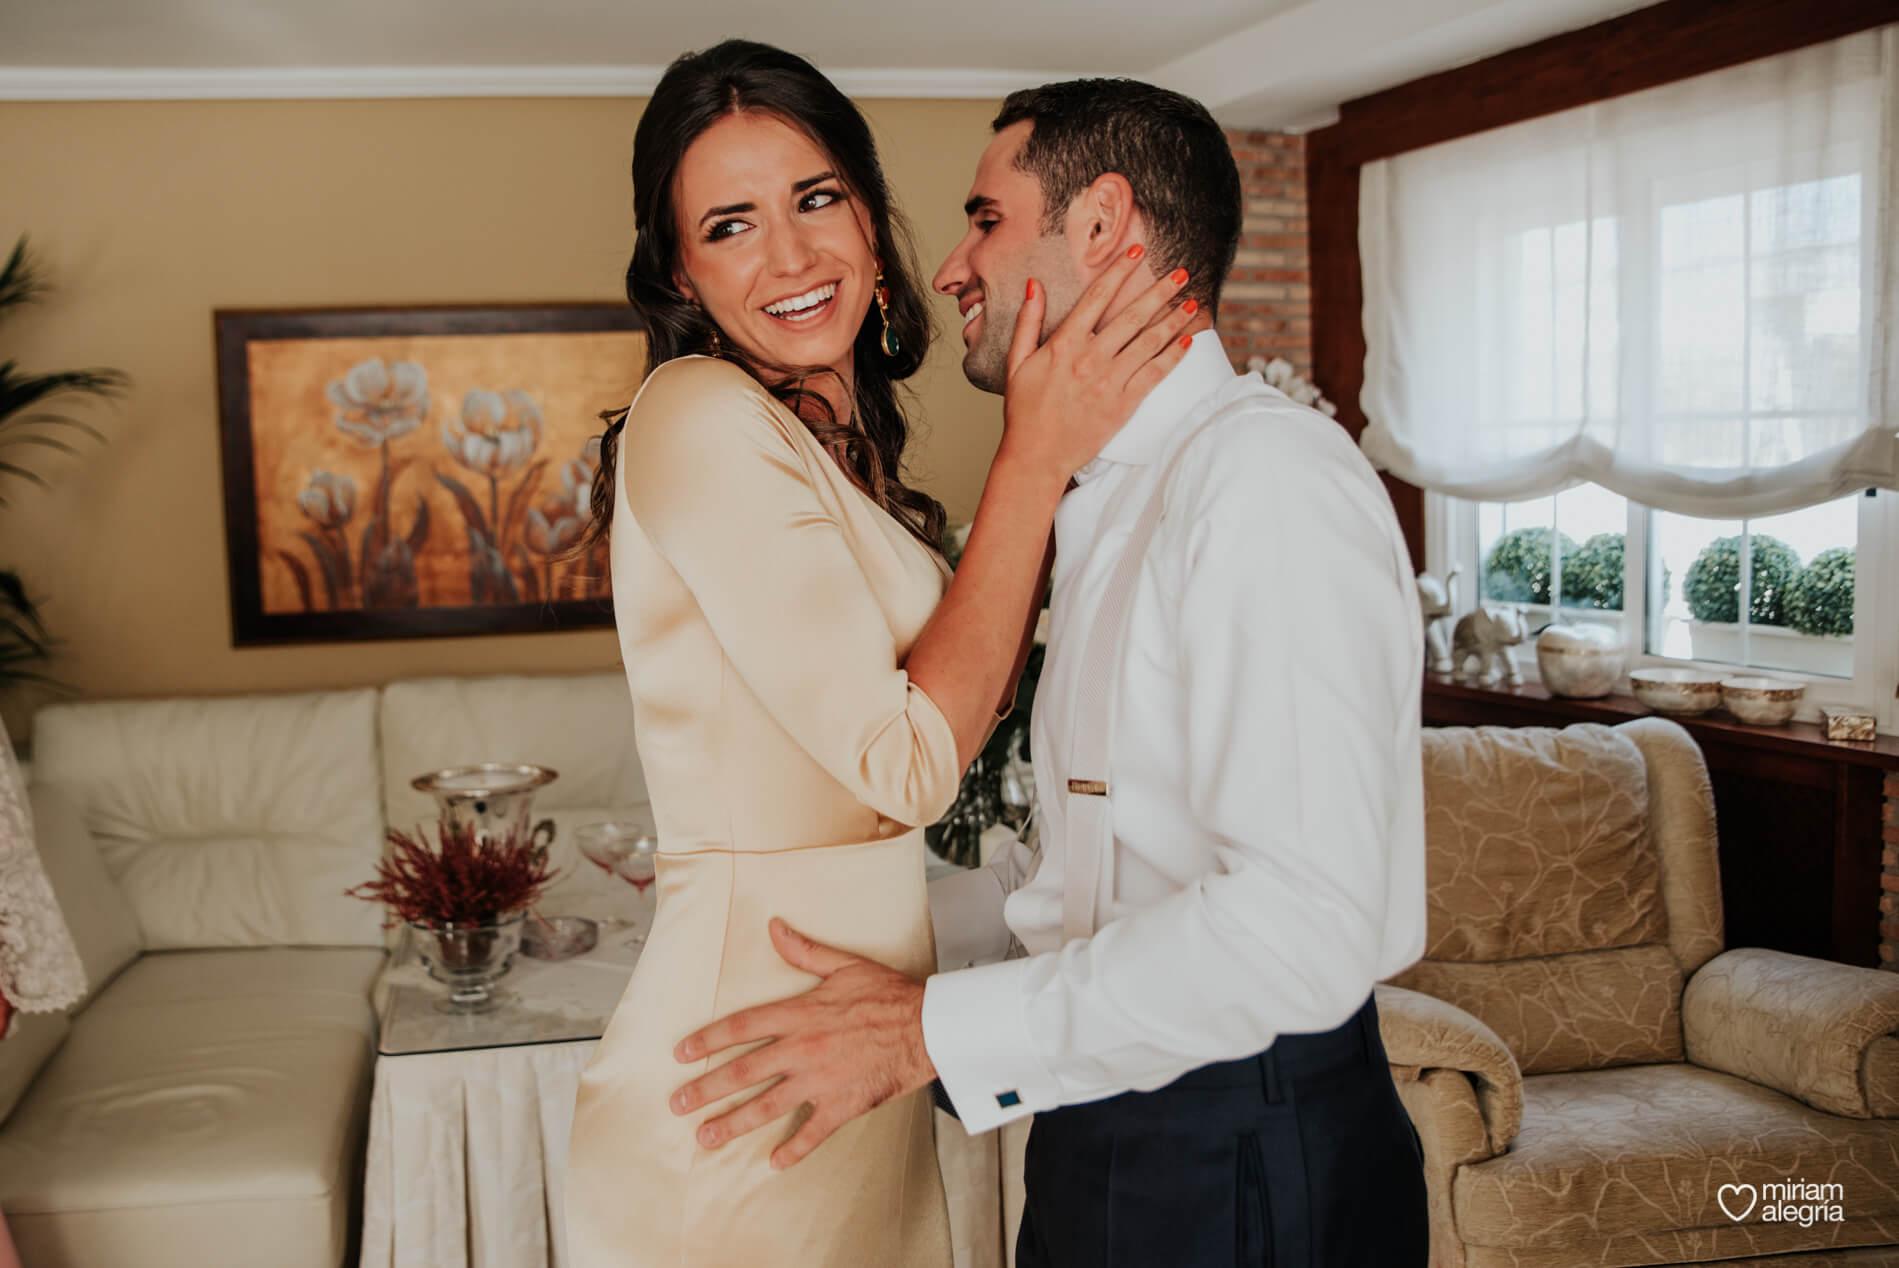 boda-en-almeria-miriam-alegria-17